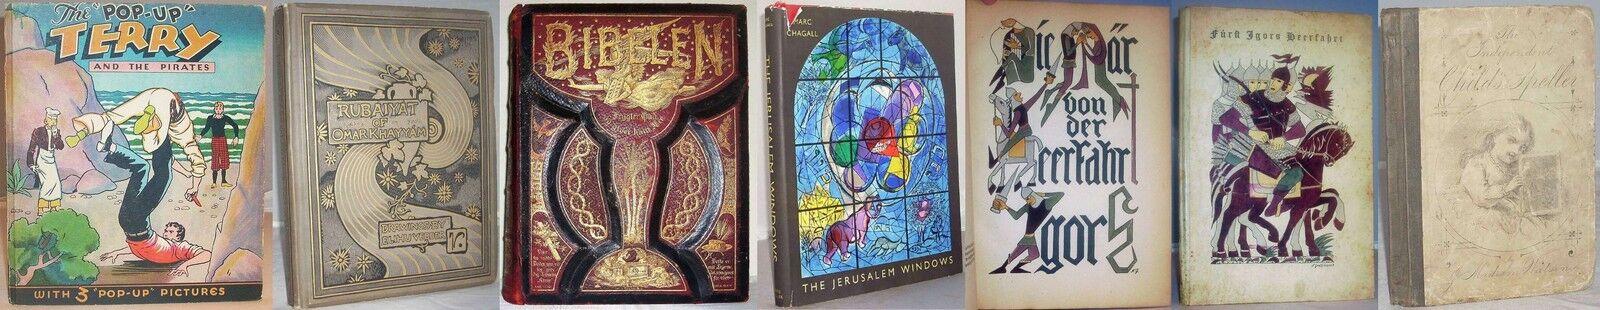 Renny's Books